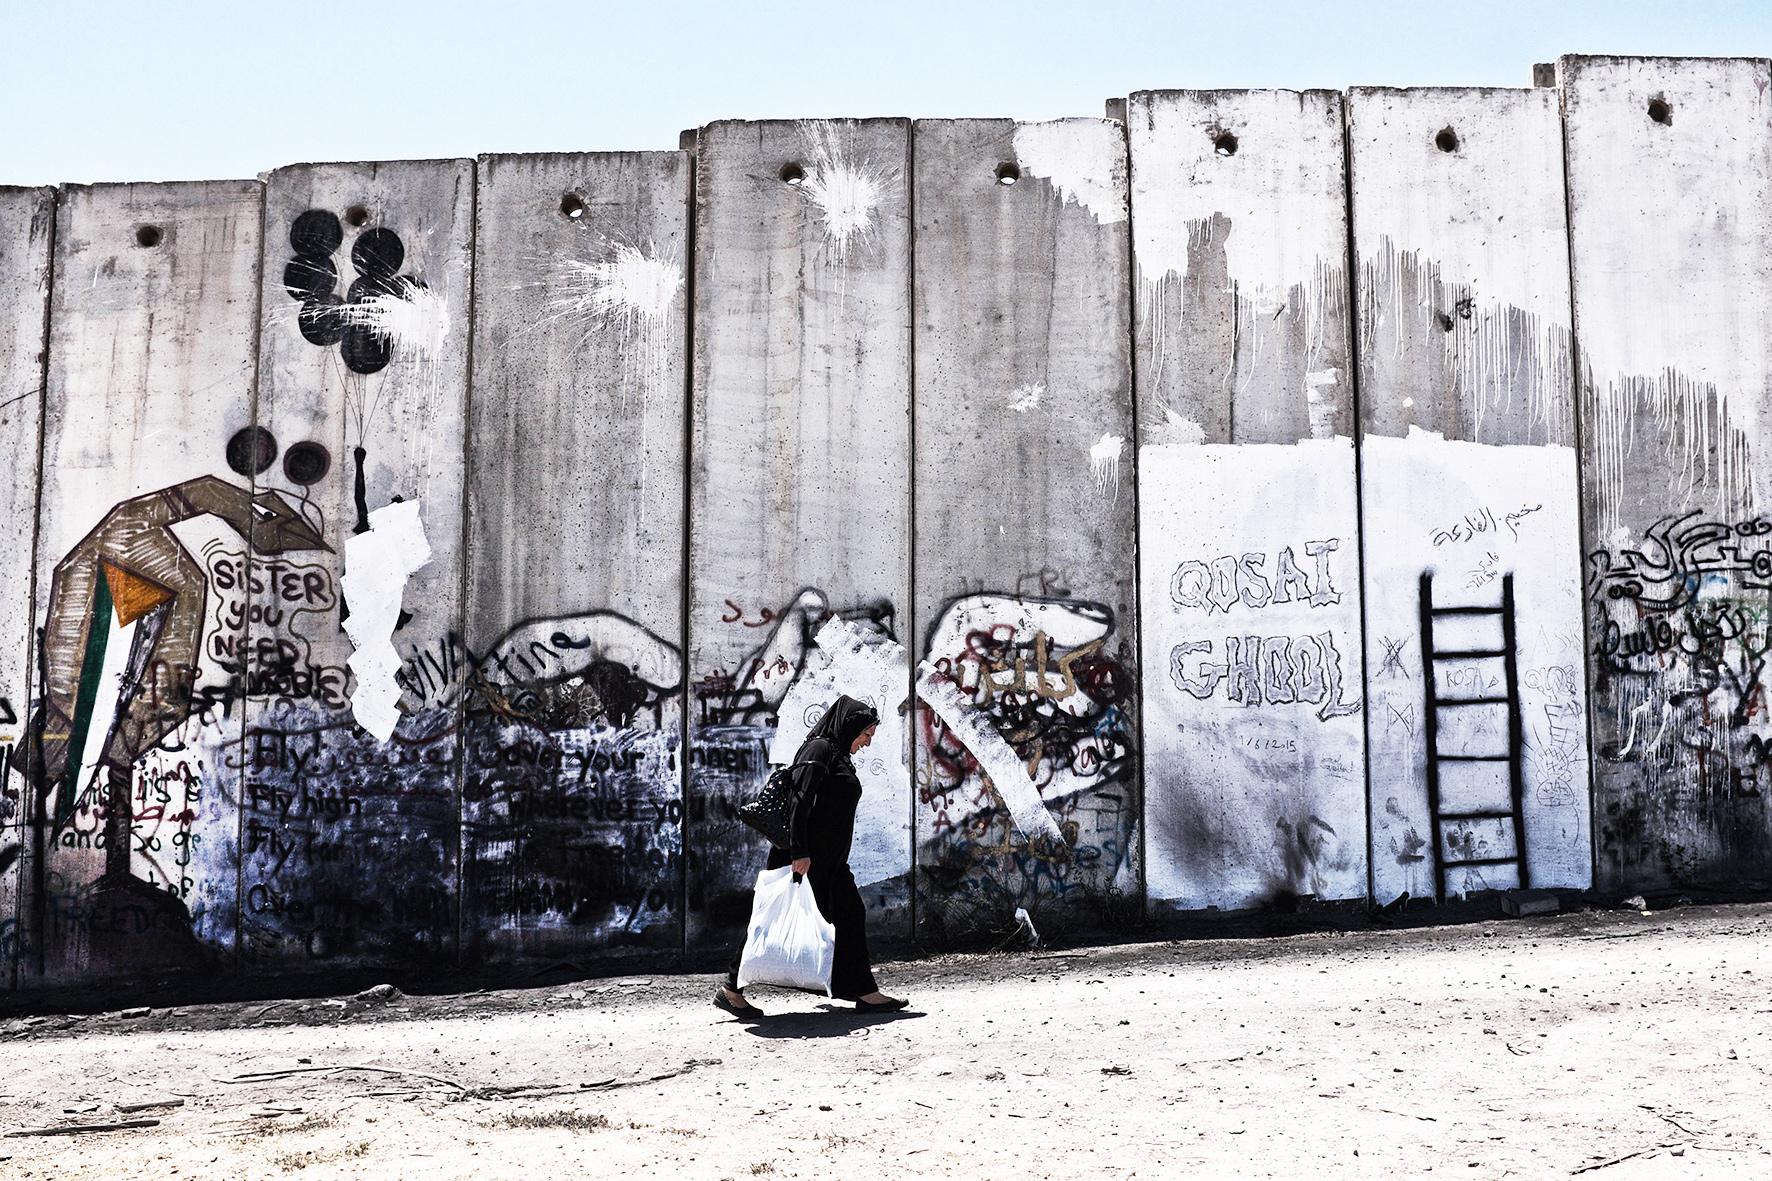 Palestine, Qalandiya. 2015